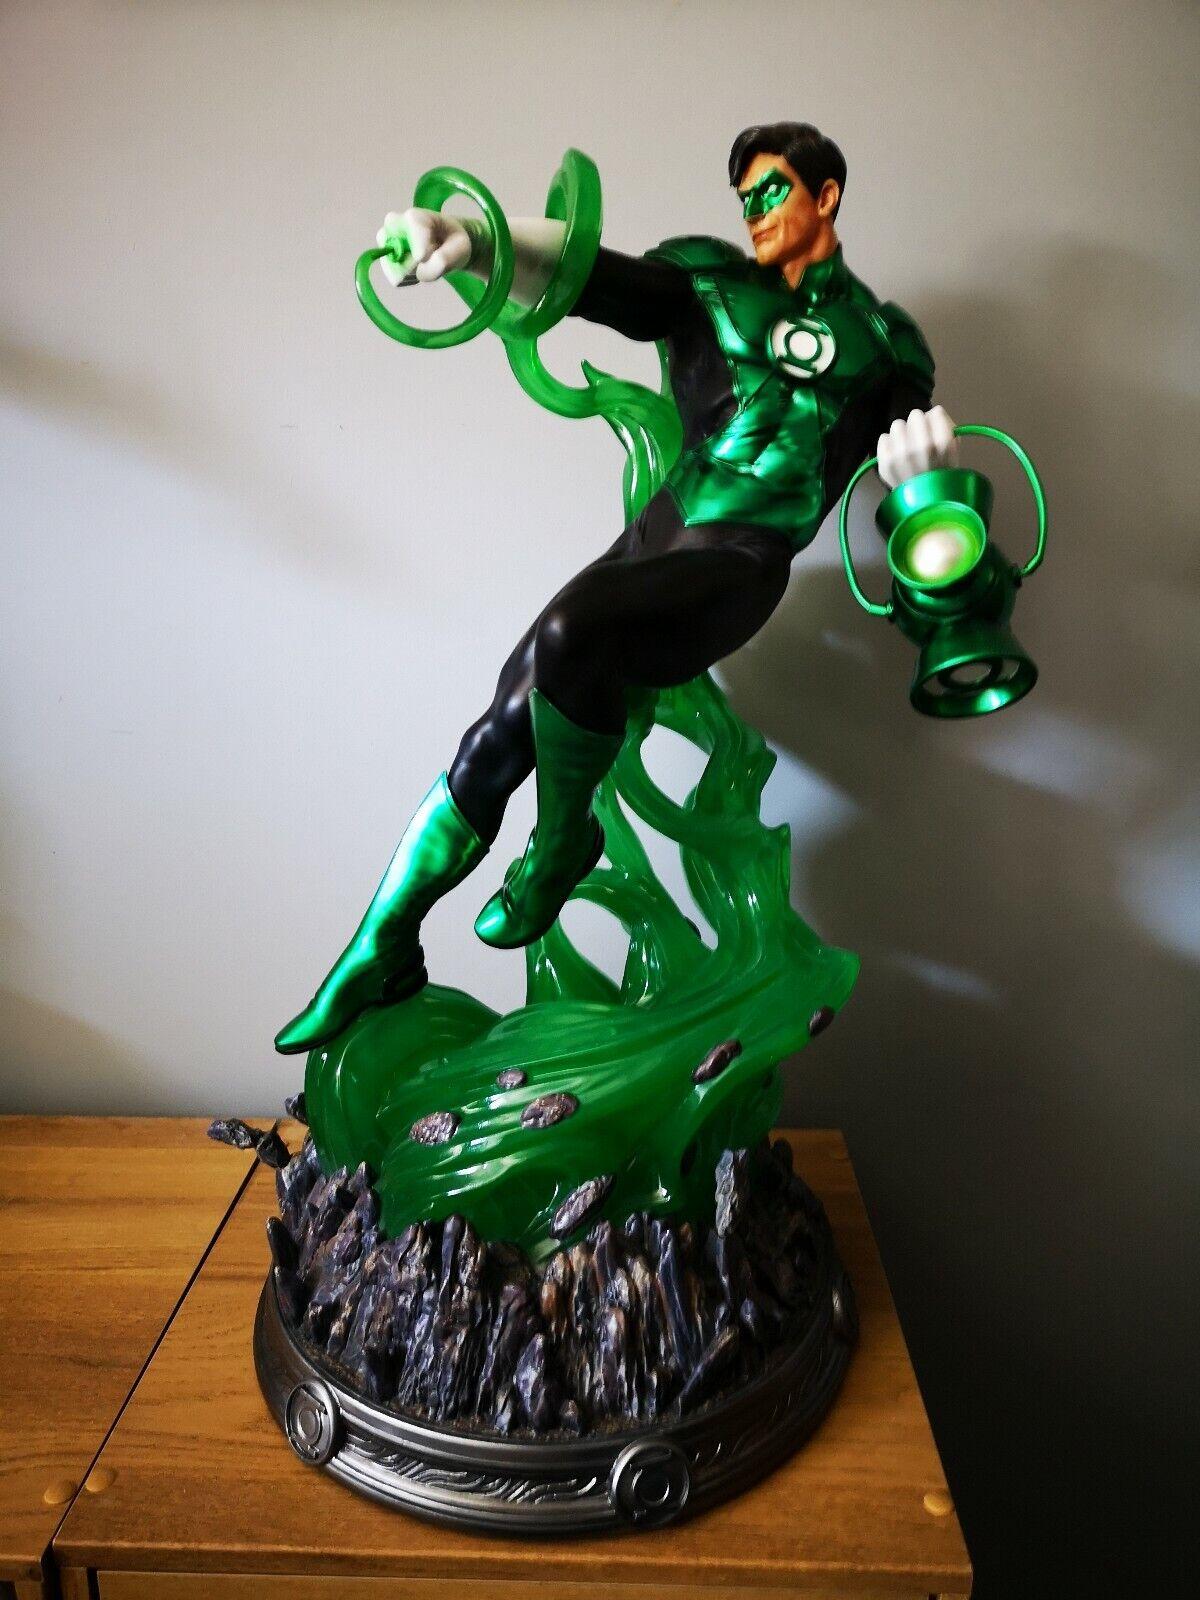 Sideshow + Prime 1 Studio - New 52 Green Lantern Exclusive Statue - Rare - No XM